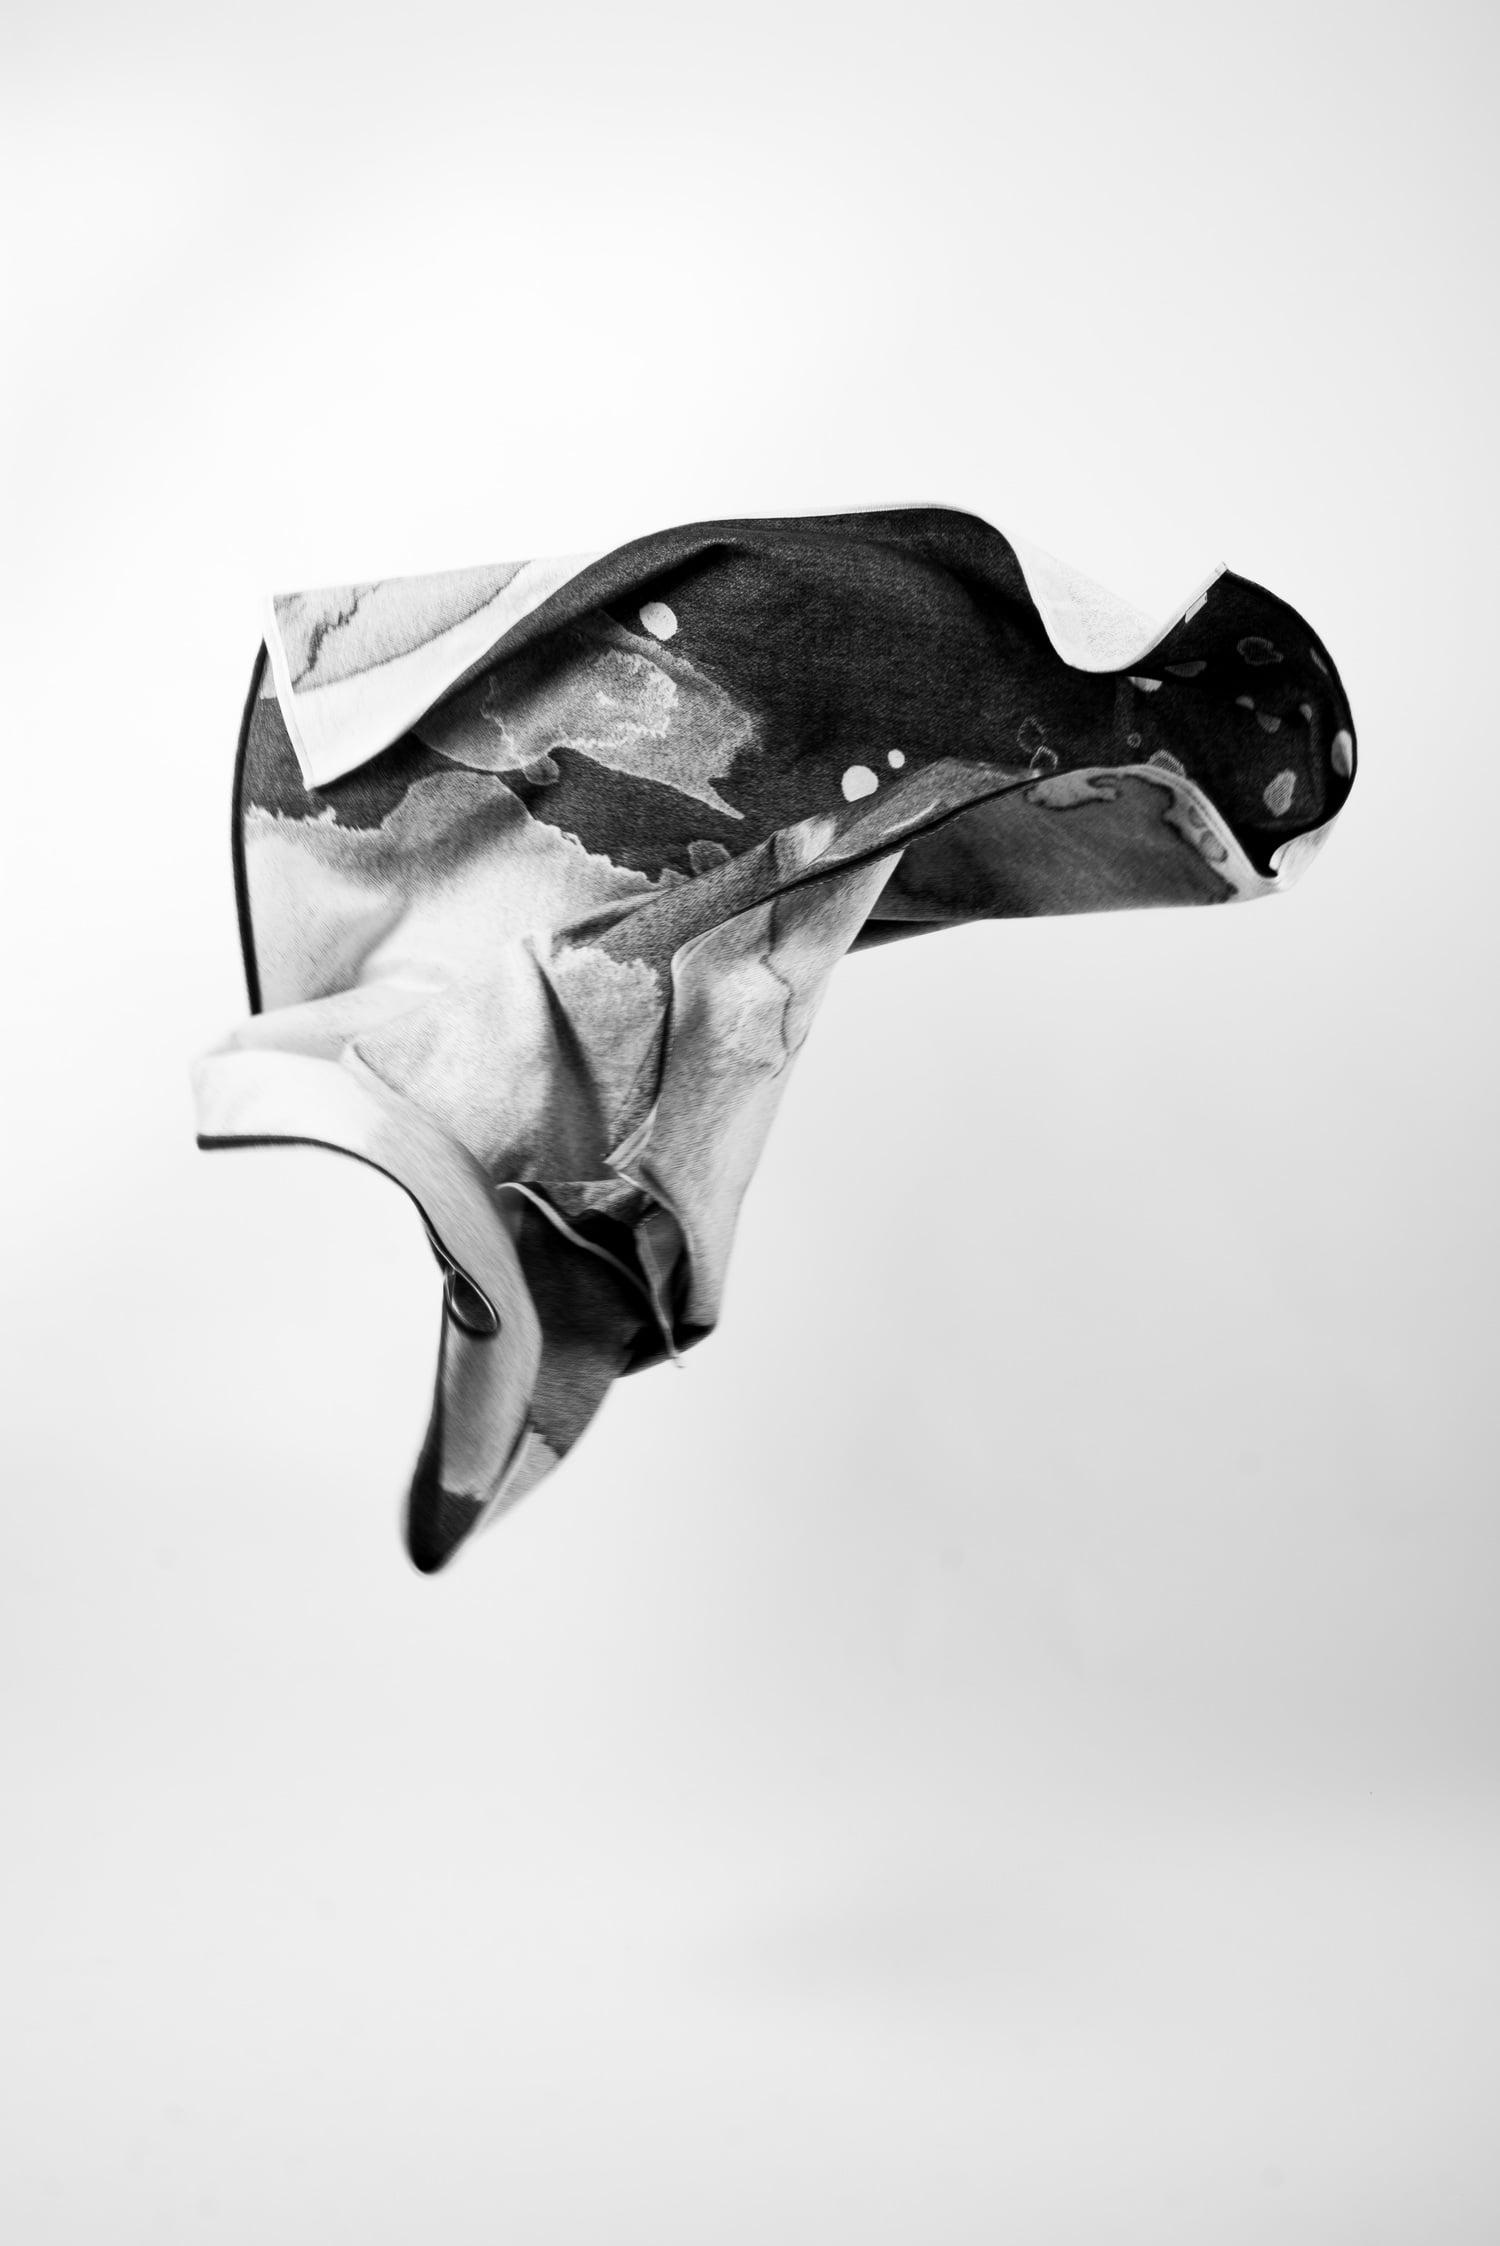 HAZY BLANKET COPERTA WATERCOLOR ACQUERELLO BLACKANDWHITE SCHNEID SCANDINAVIAN DESIGN SCANDINAVO SPAZIO MATERIAE NAPOLI 2.jpg